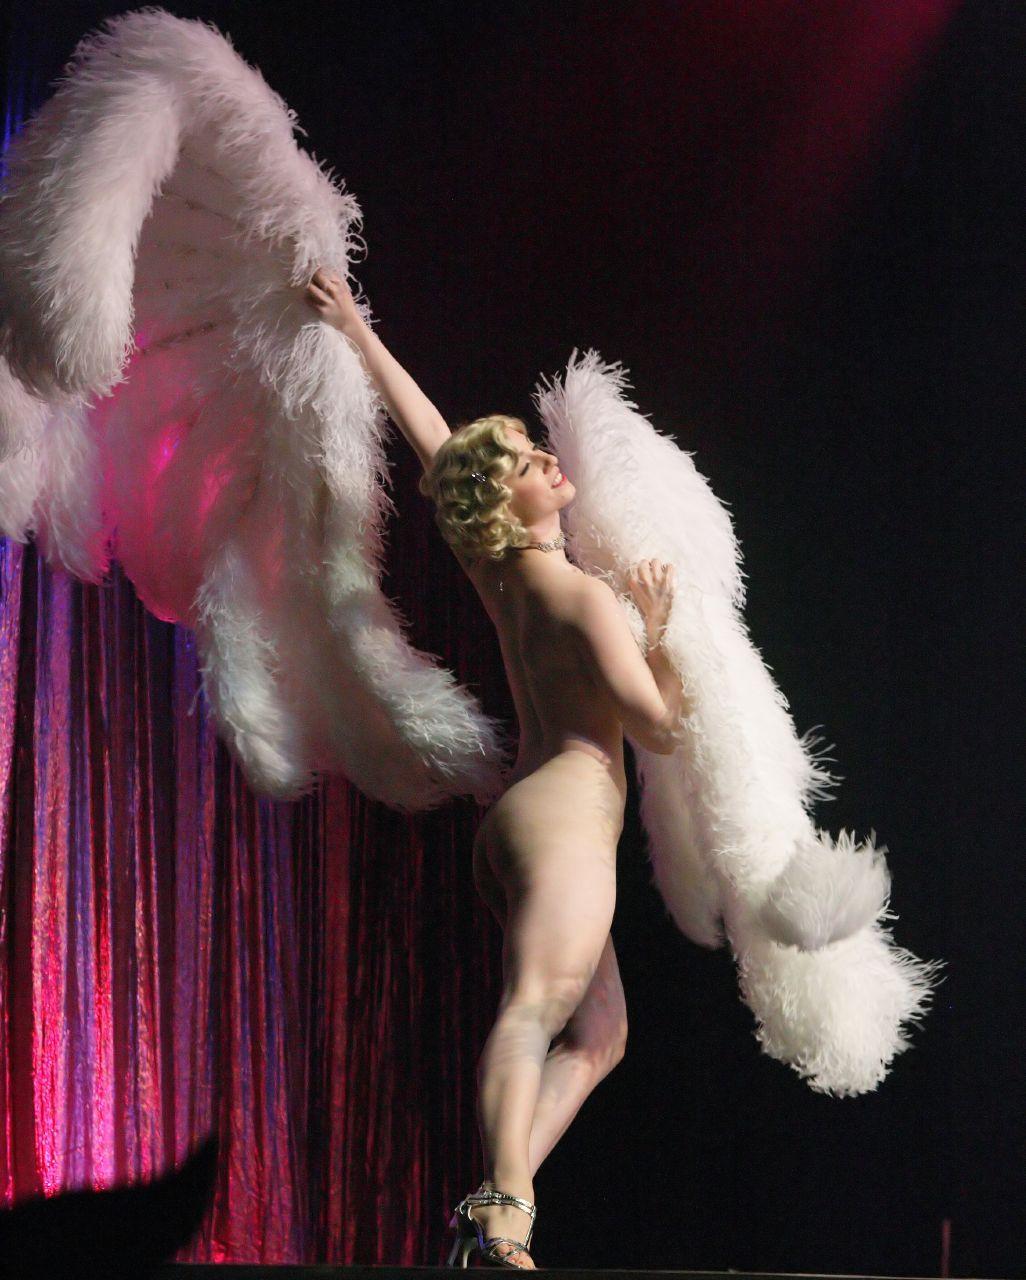 7fa5510a4070 Michelle L amour - Google Search   Burlesque   Burlesque, Dance und ...